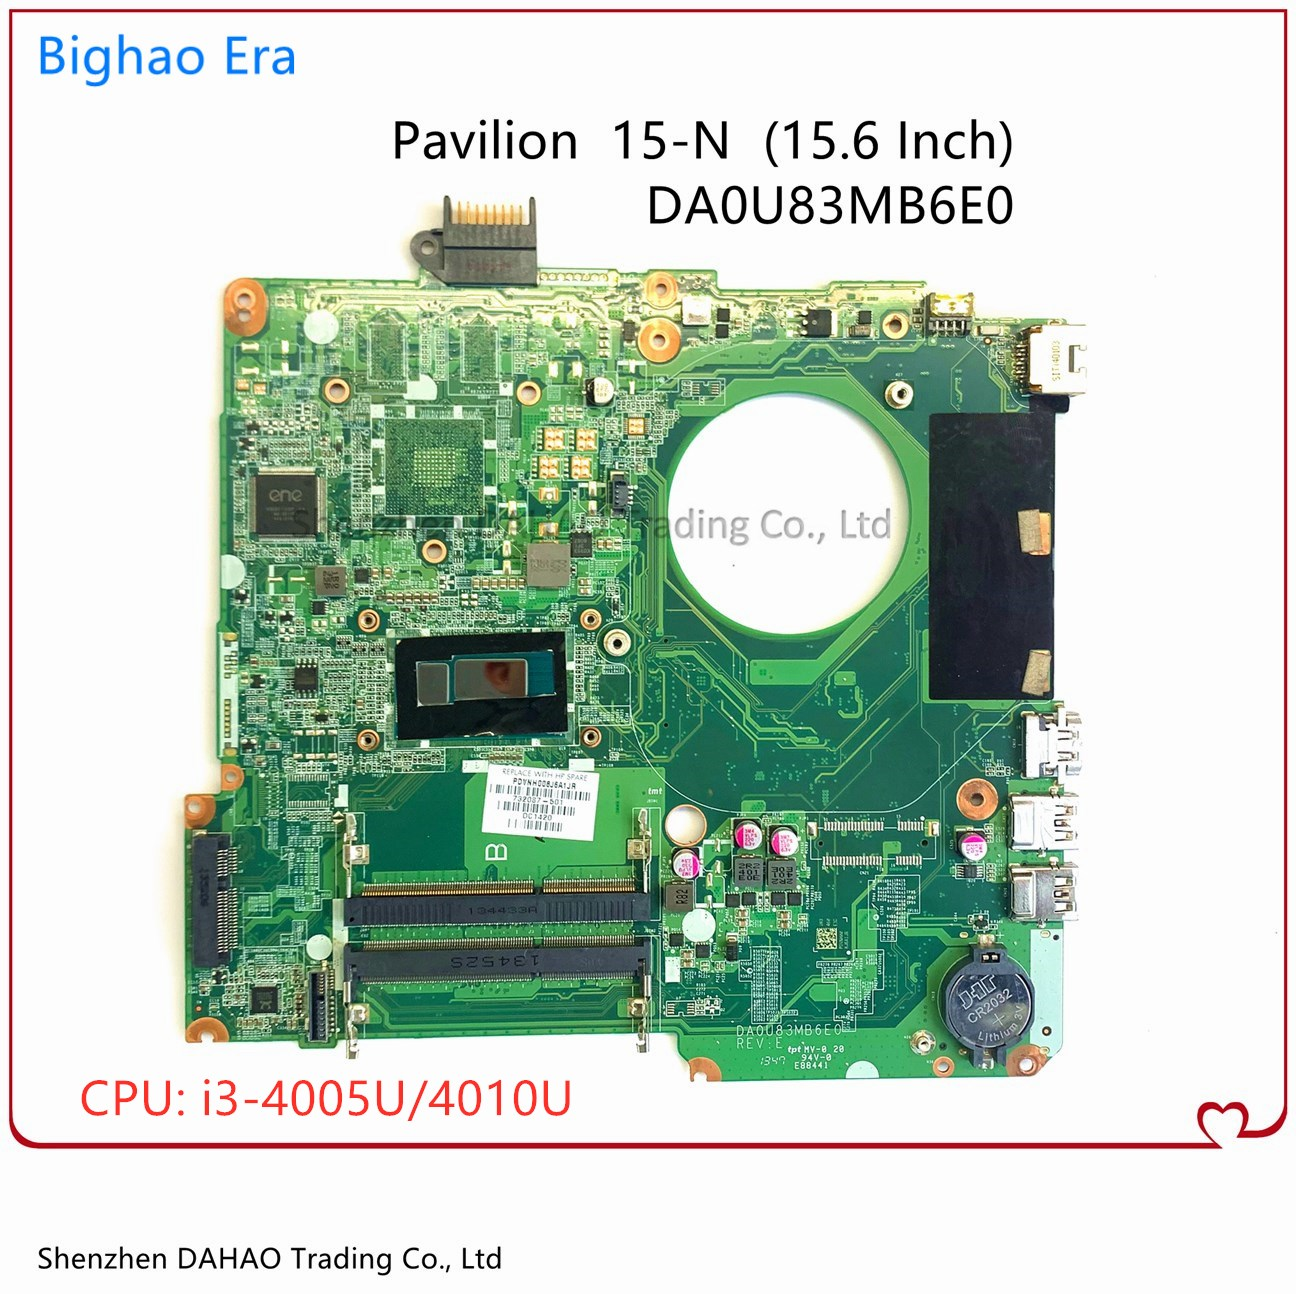 790202-501 782103-501 732087-501 For HP Pavilion 15 15-N 15-F U83 Laptop Motherboard DA0U83MB6E0 W/ I3 CPU DDR3L 100% Fully Test 1